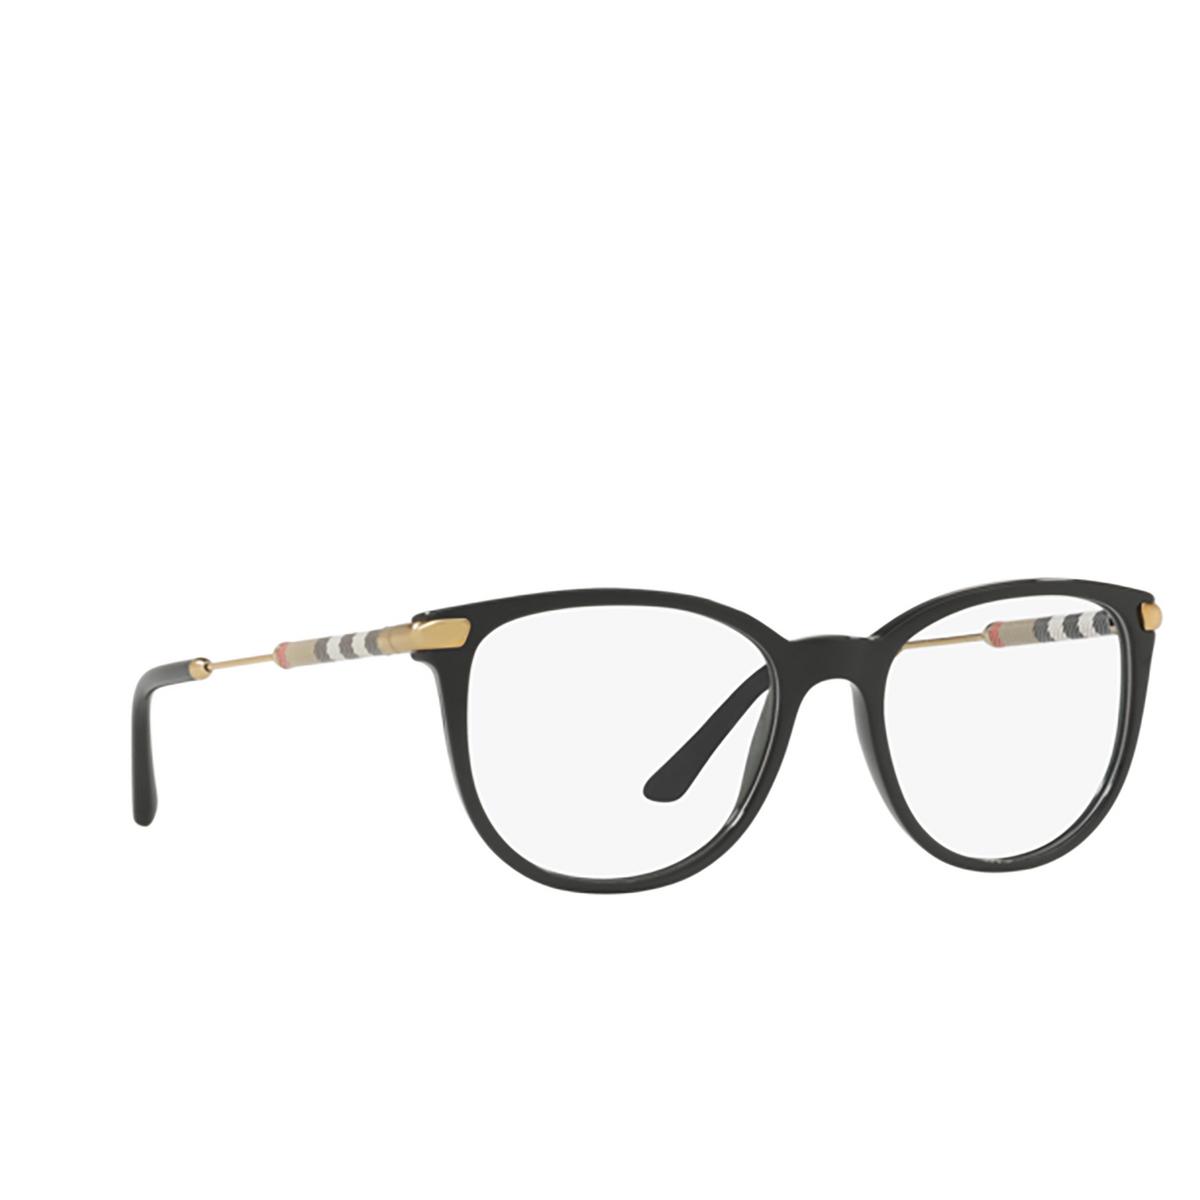 Burberry® Square Eyeglasses: BE2255Q color Black 3001 - three-quarters view.